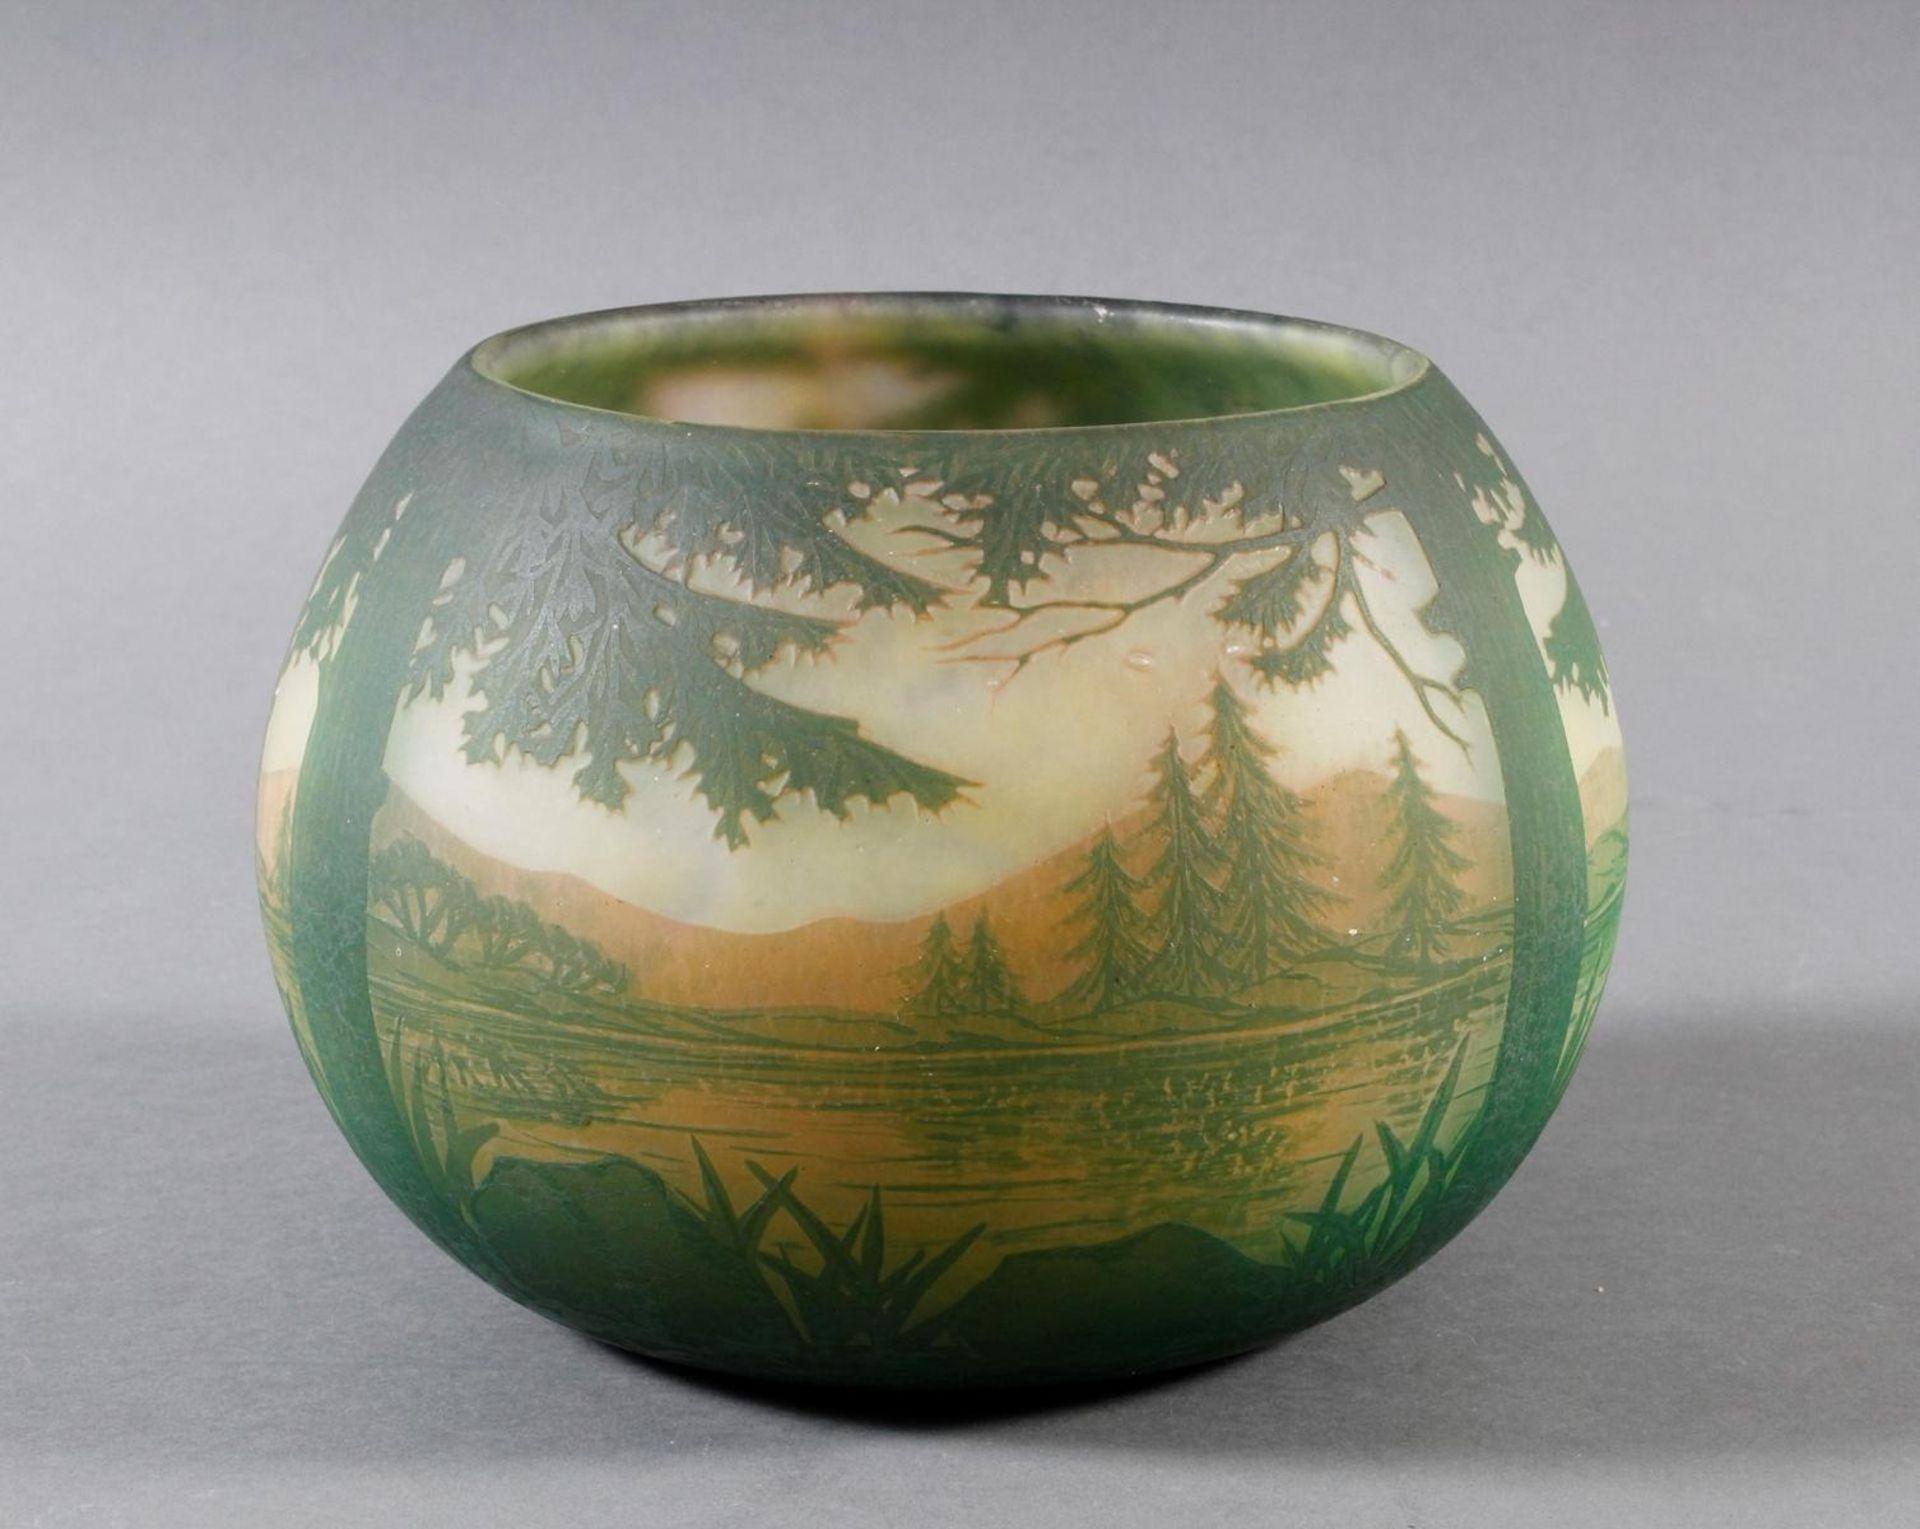 Daum Nancy, Vase Frankreich um 1900